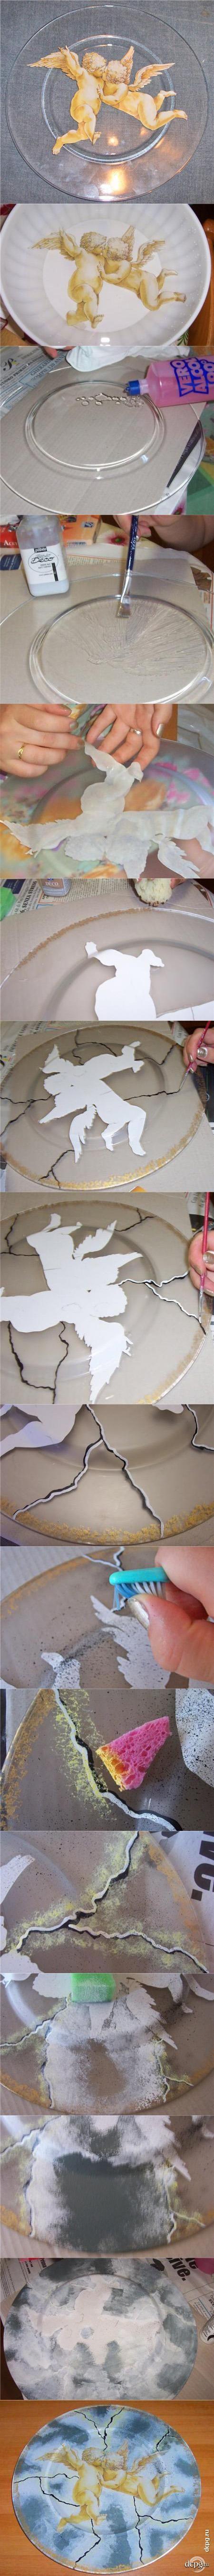 Декупаж - Сайт любителей декупажа - DCPG.RU | Имитация мрамора на тарелочке Click on photo to see more! Нажмите на фото чтобы увидеть больше!  decoupage art craft handmade home decor DIY do it yourself tutorial plate